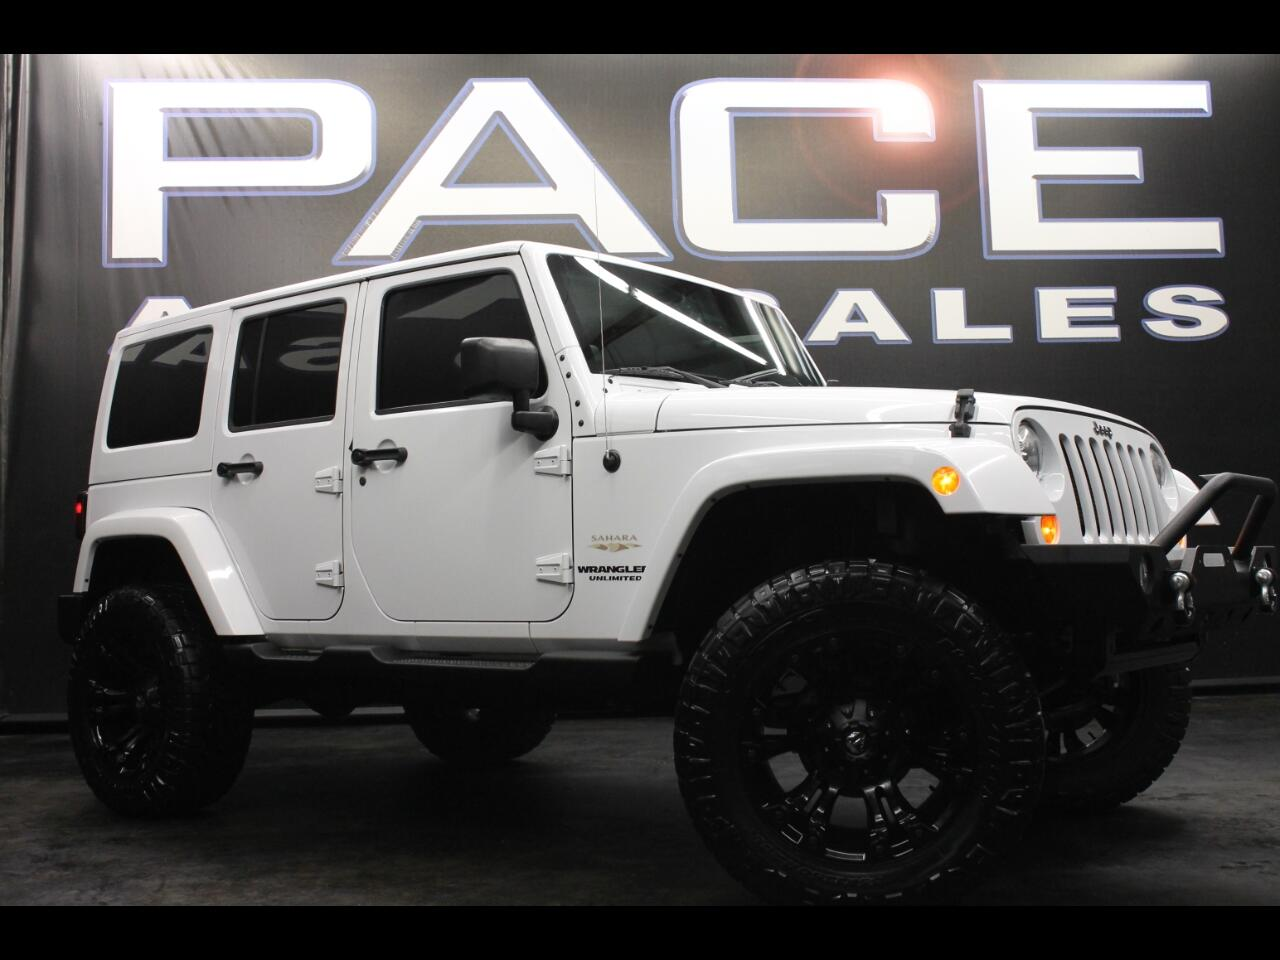 2013 Jeep Wrangler Unlimited 4WD Sahara Custom Lifted